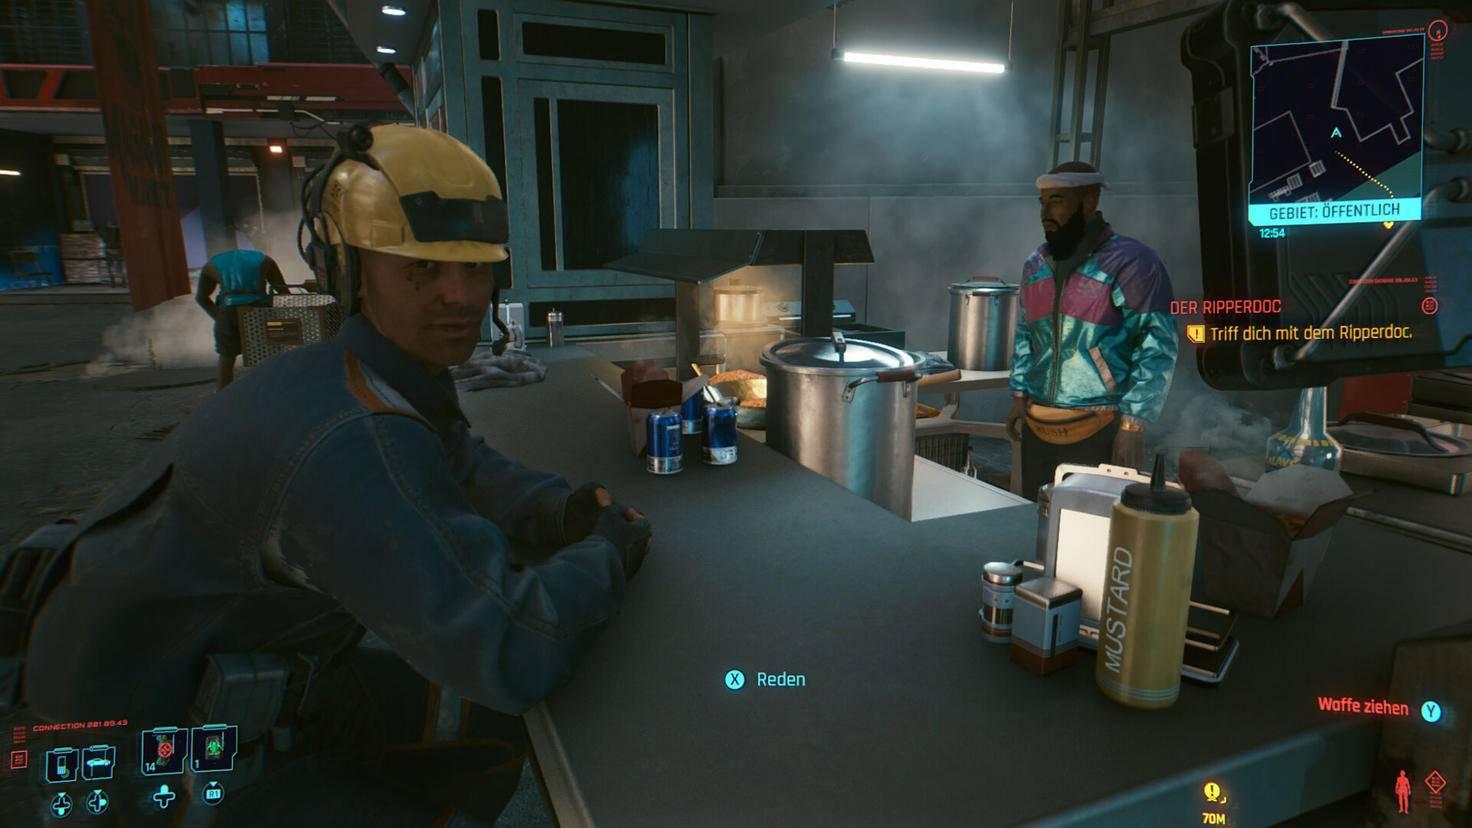 cyberpunk-2077-stadia-screenshot-04